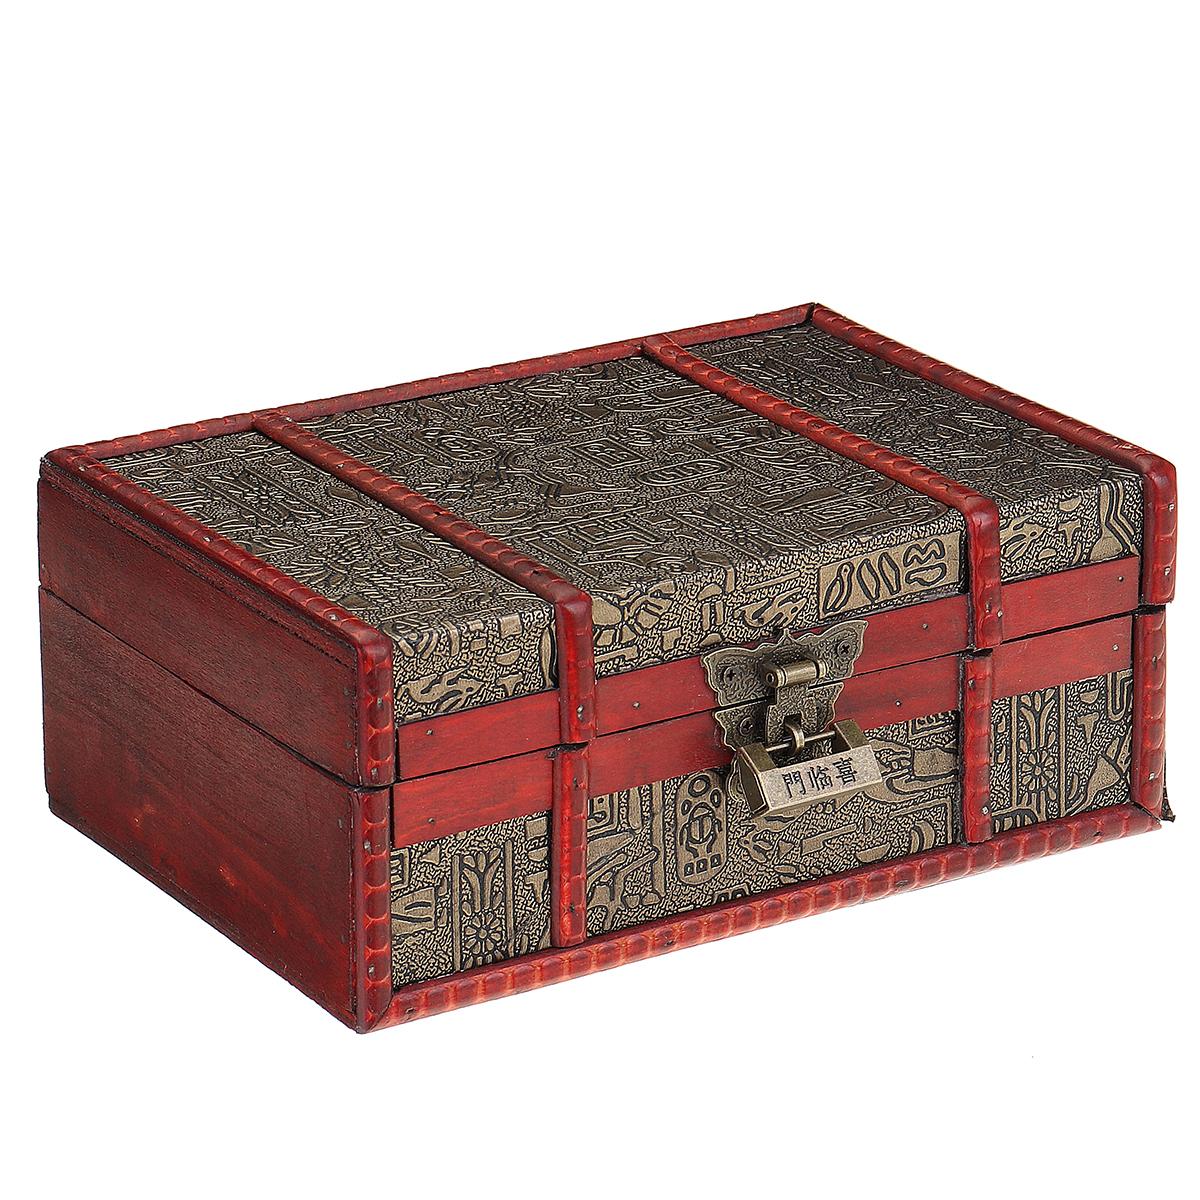 Set Vintage Wooden Pirate Treasure Trinket Chest Jewellery Storage Box Case Gift